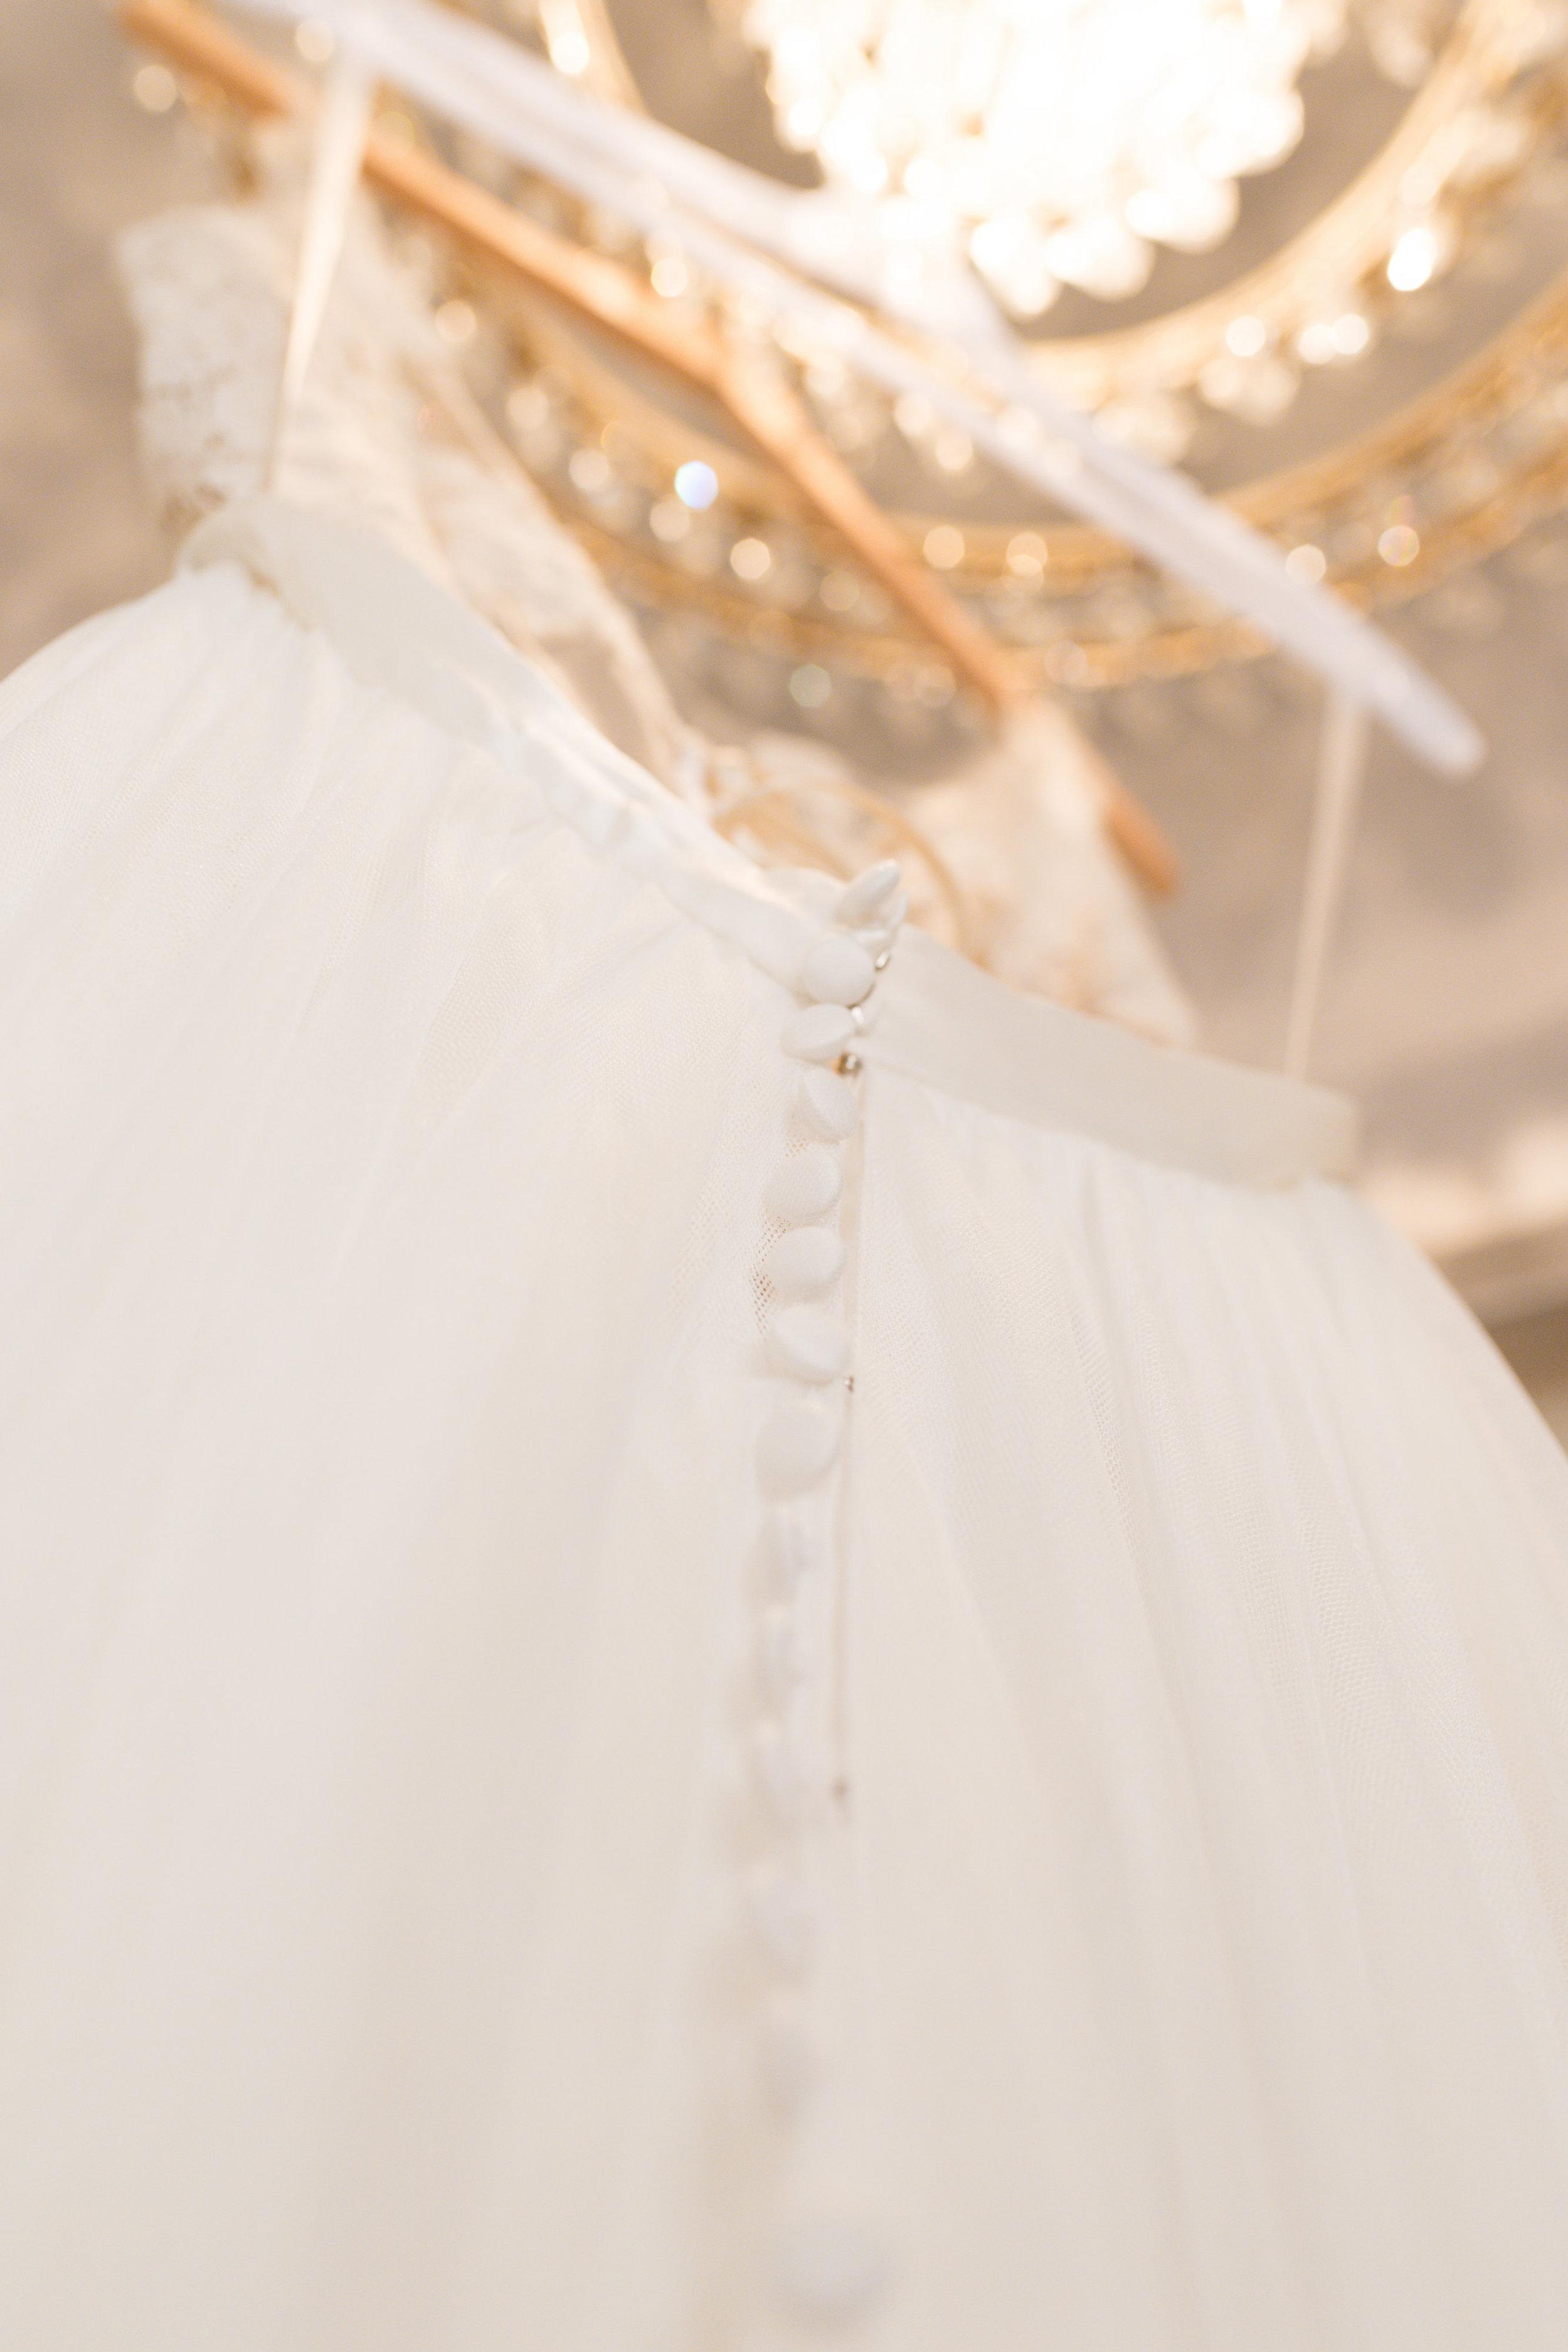 Maggie Tony Wedding-Details-0014.jpg